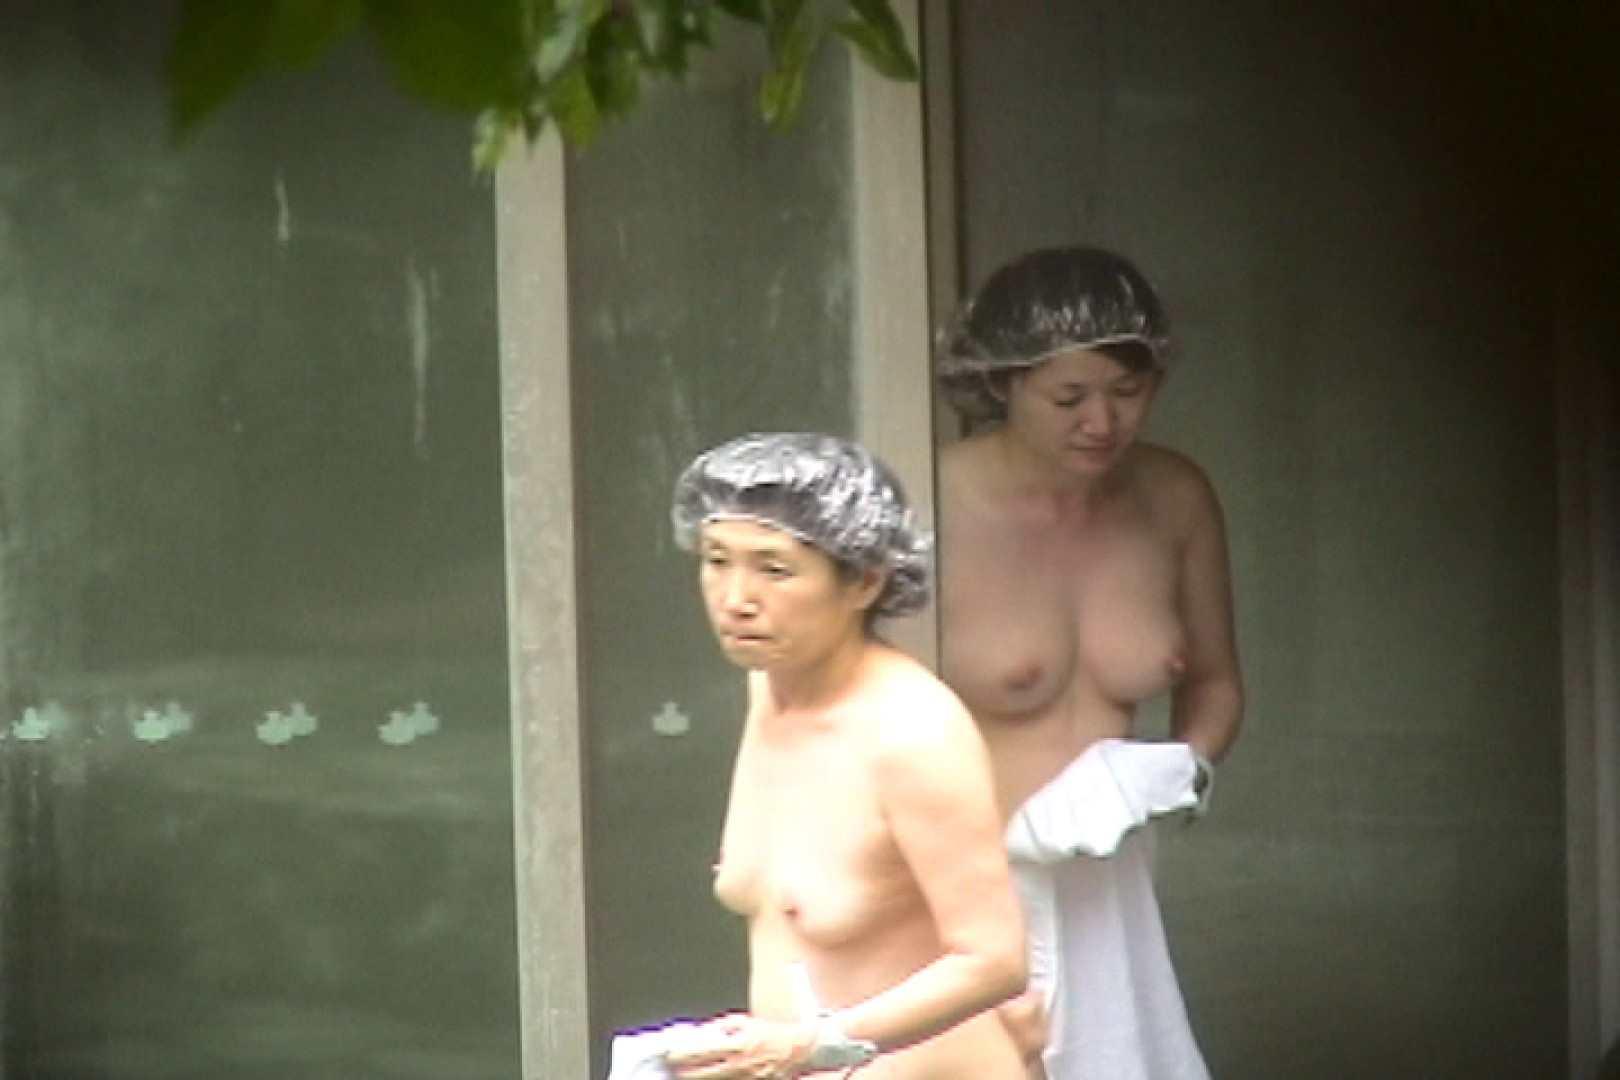 Aquaな露天風呂Vol.456 盗撮師作品  88pic 63